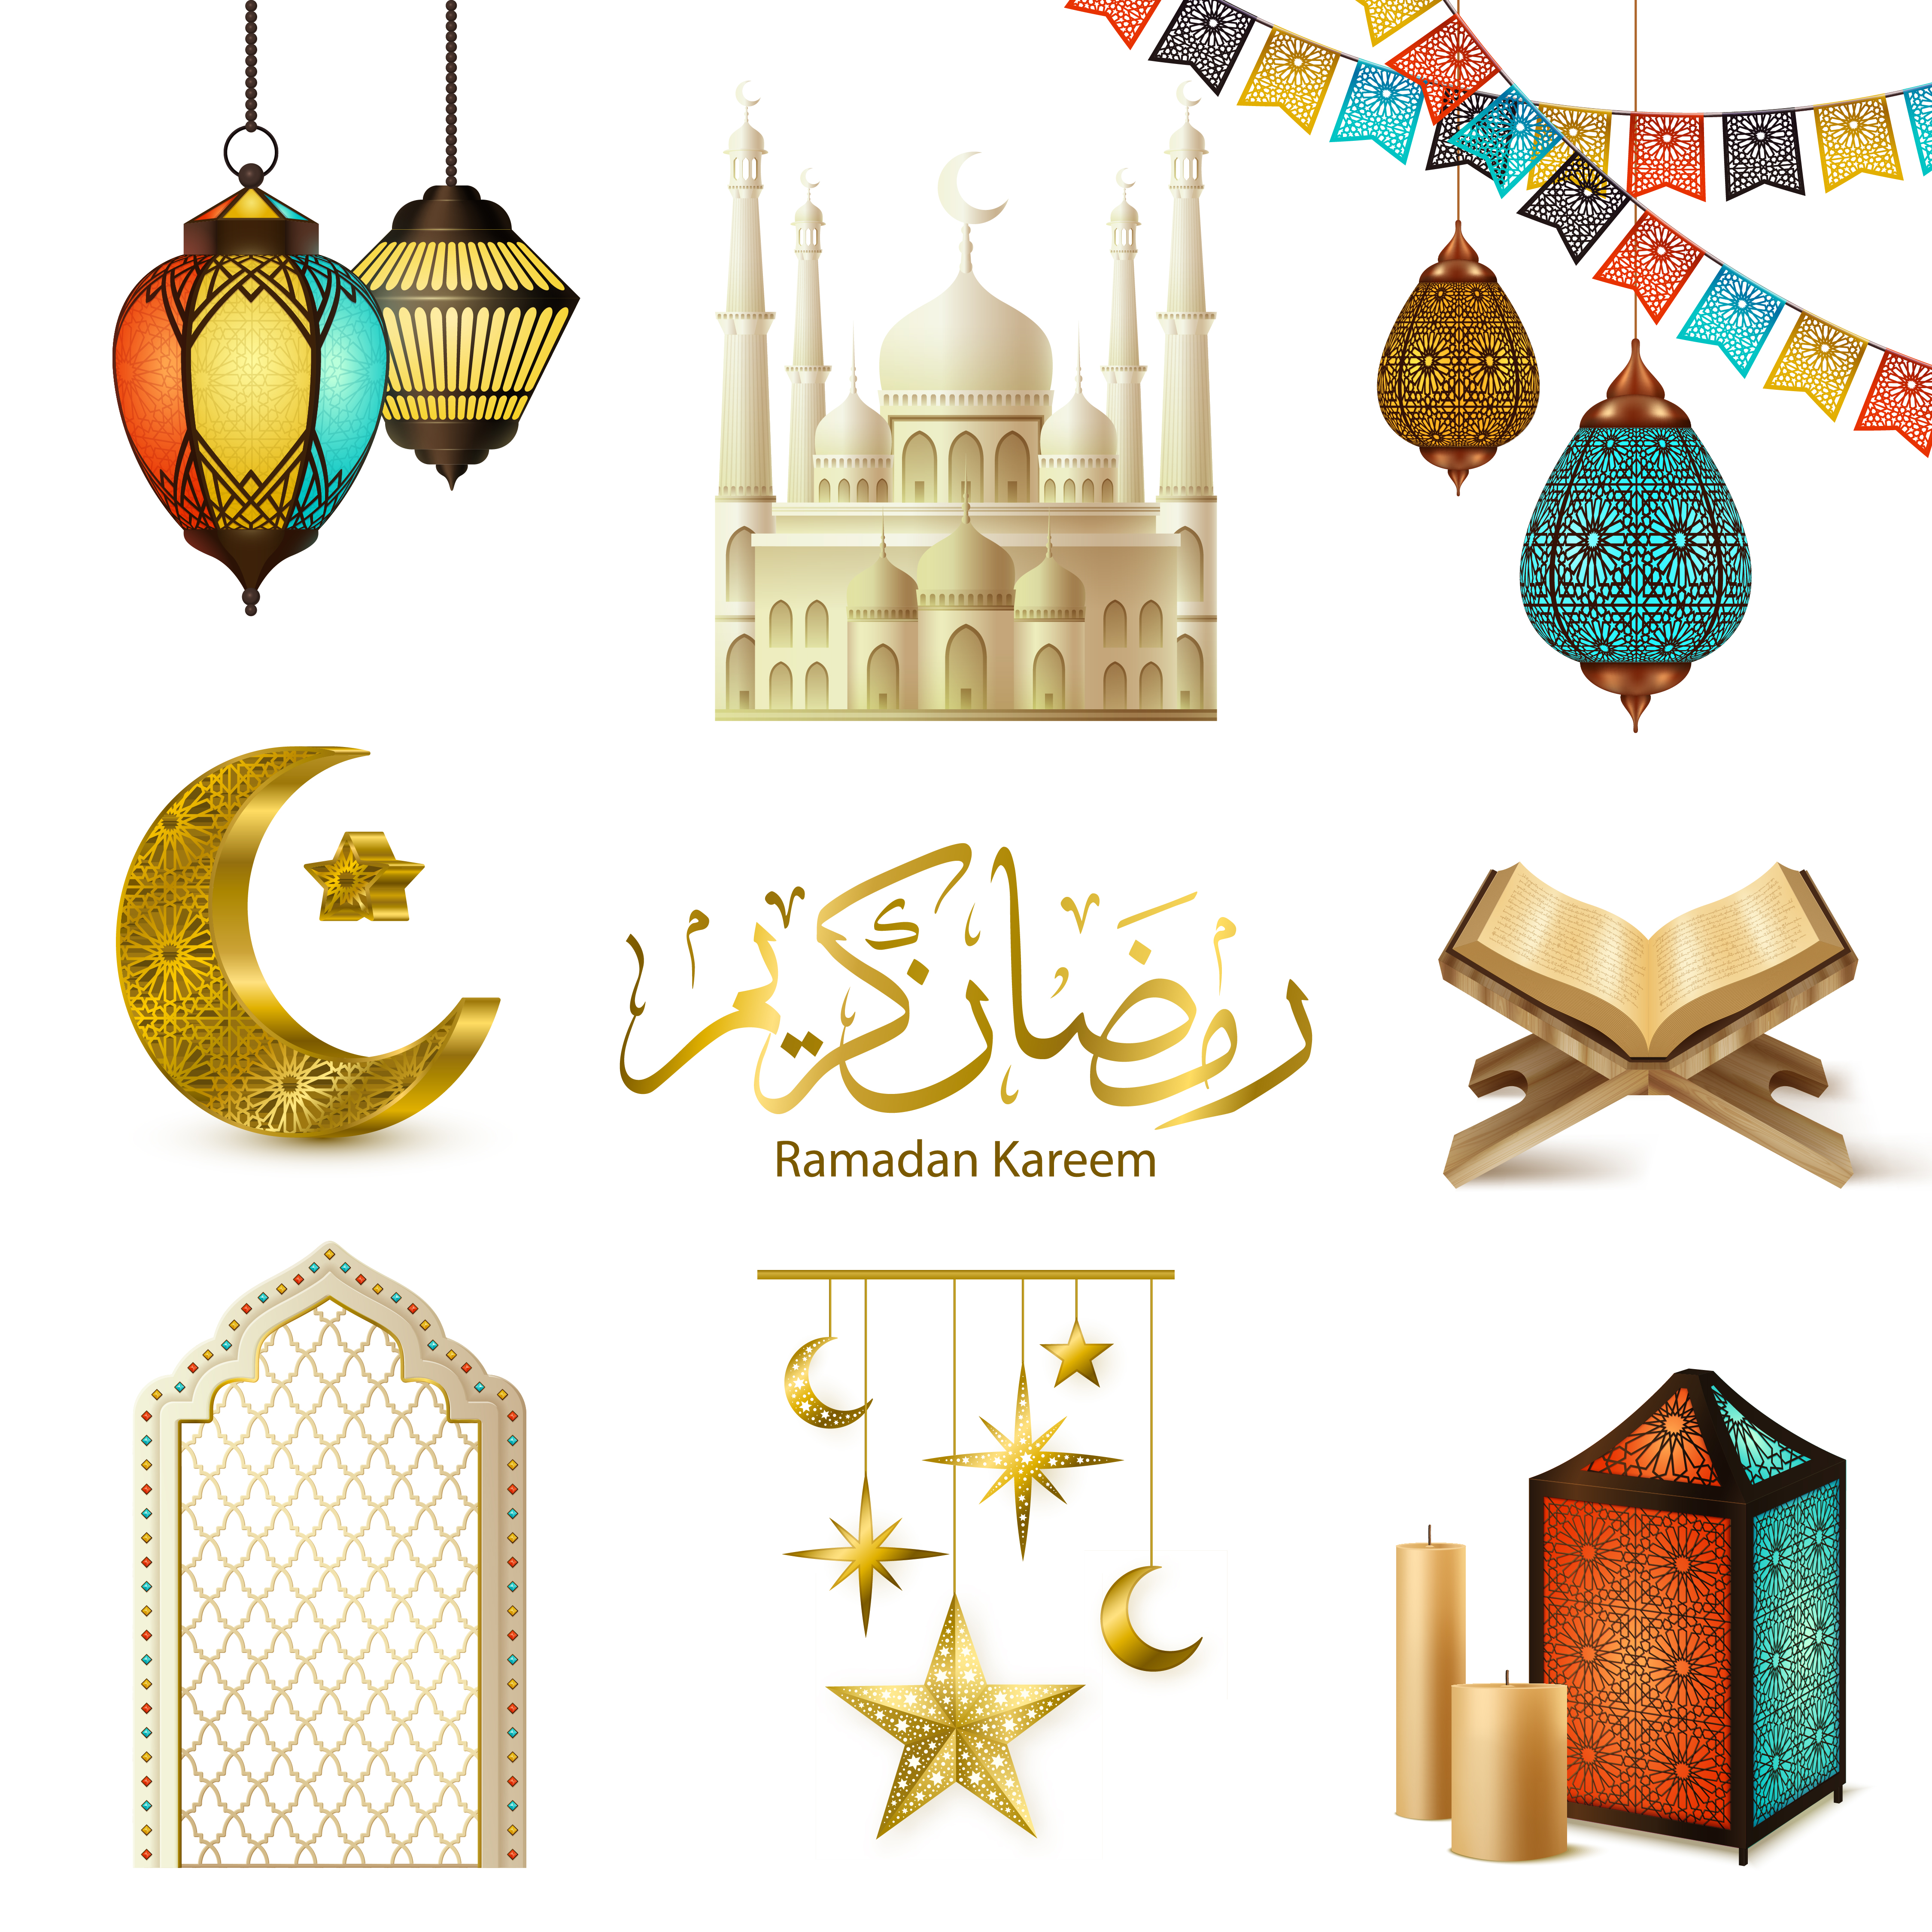 What is Bradford Fasting Time in Ramadan 2020?